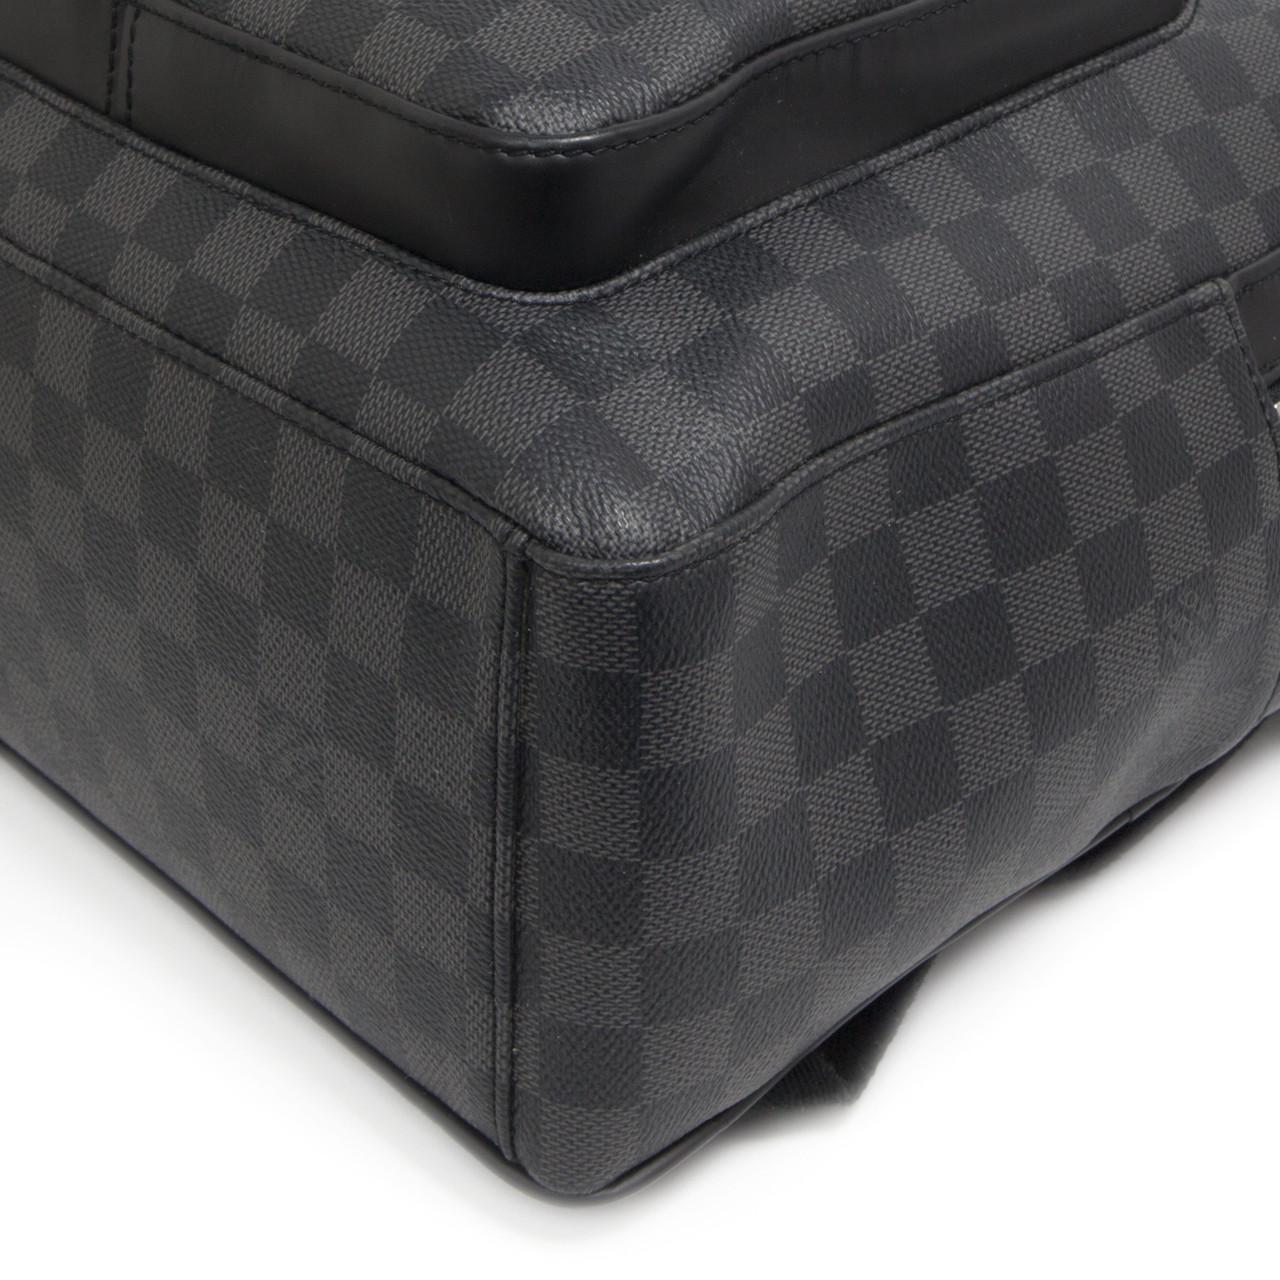 daae8d6f9322 Louis Vuitton Damier Graphite Josh Backpack - modaselle